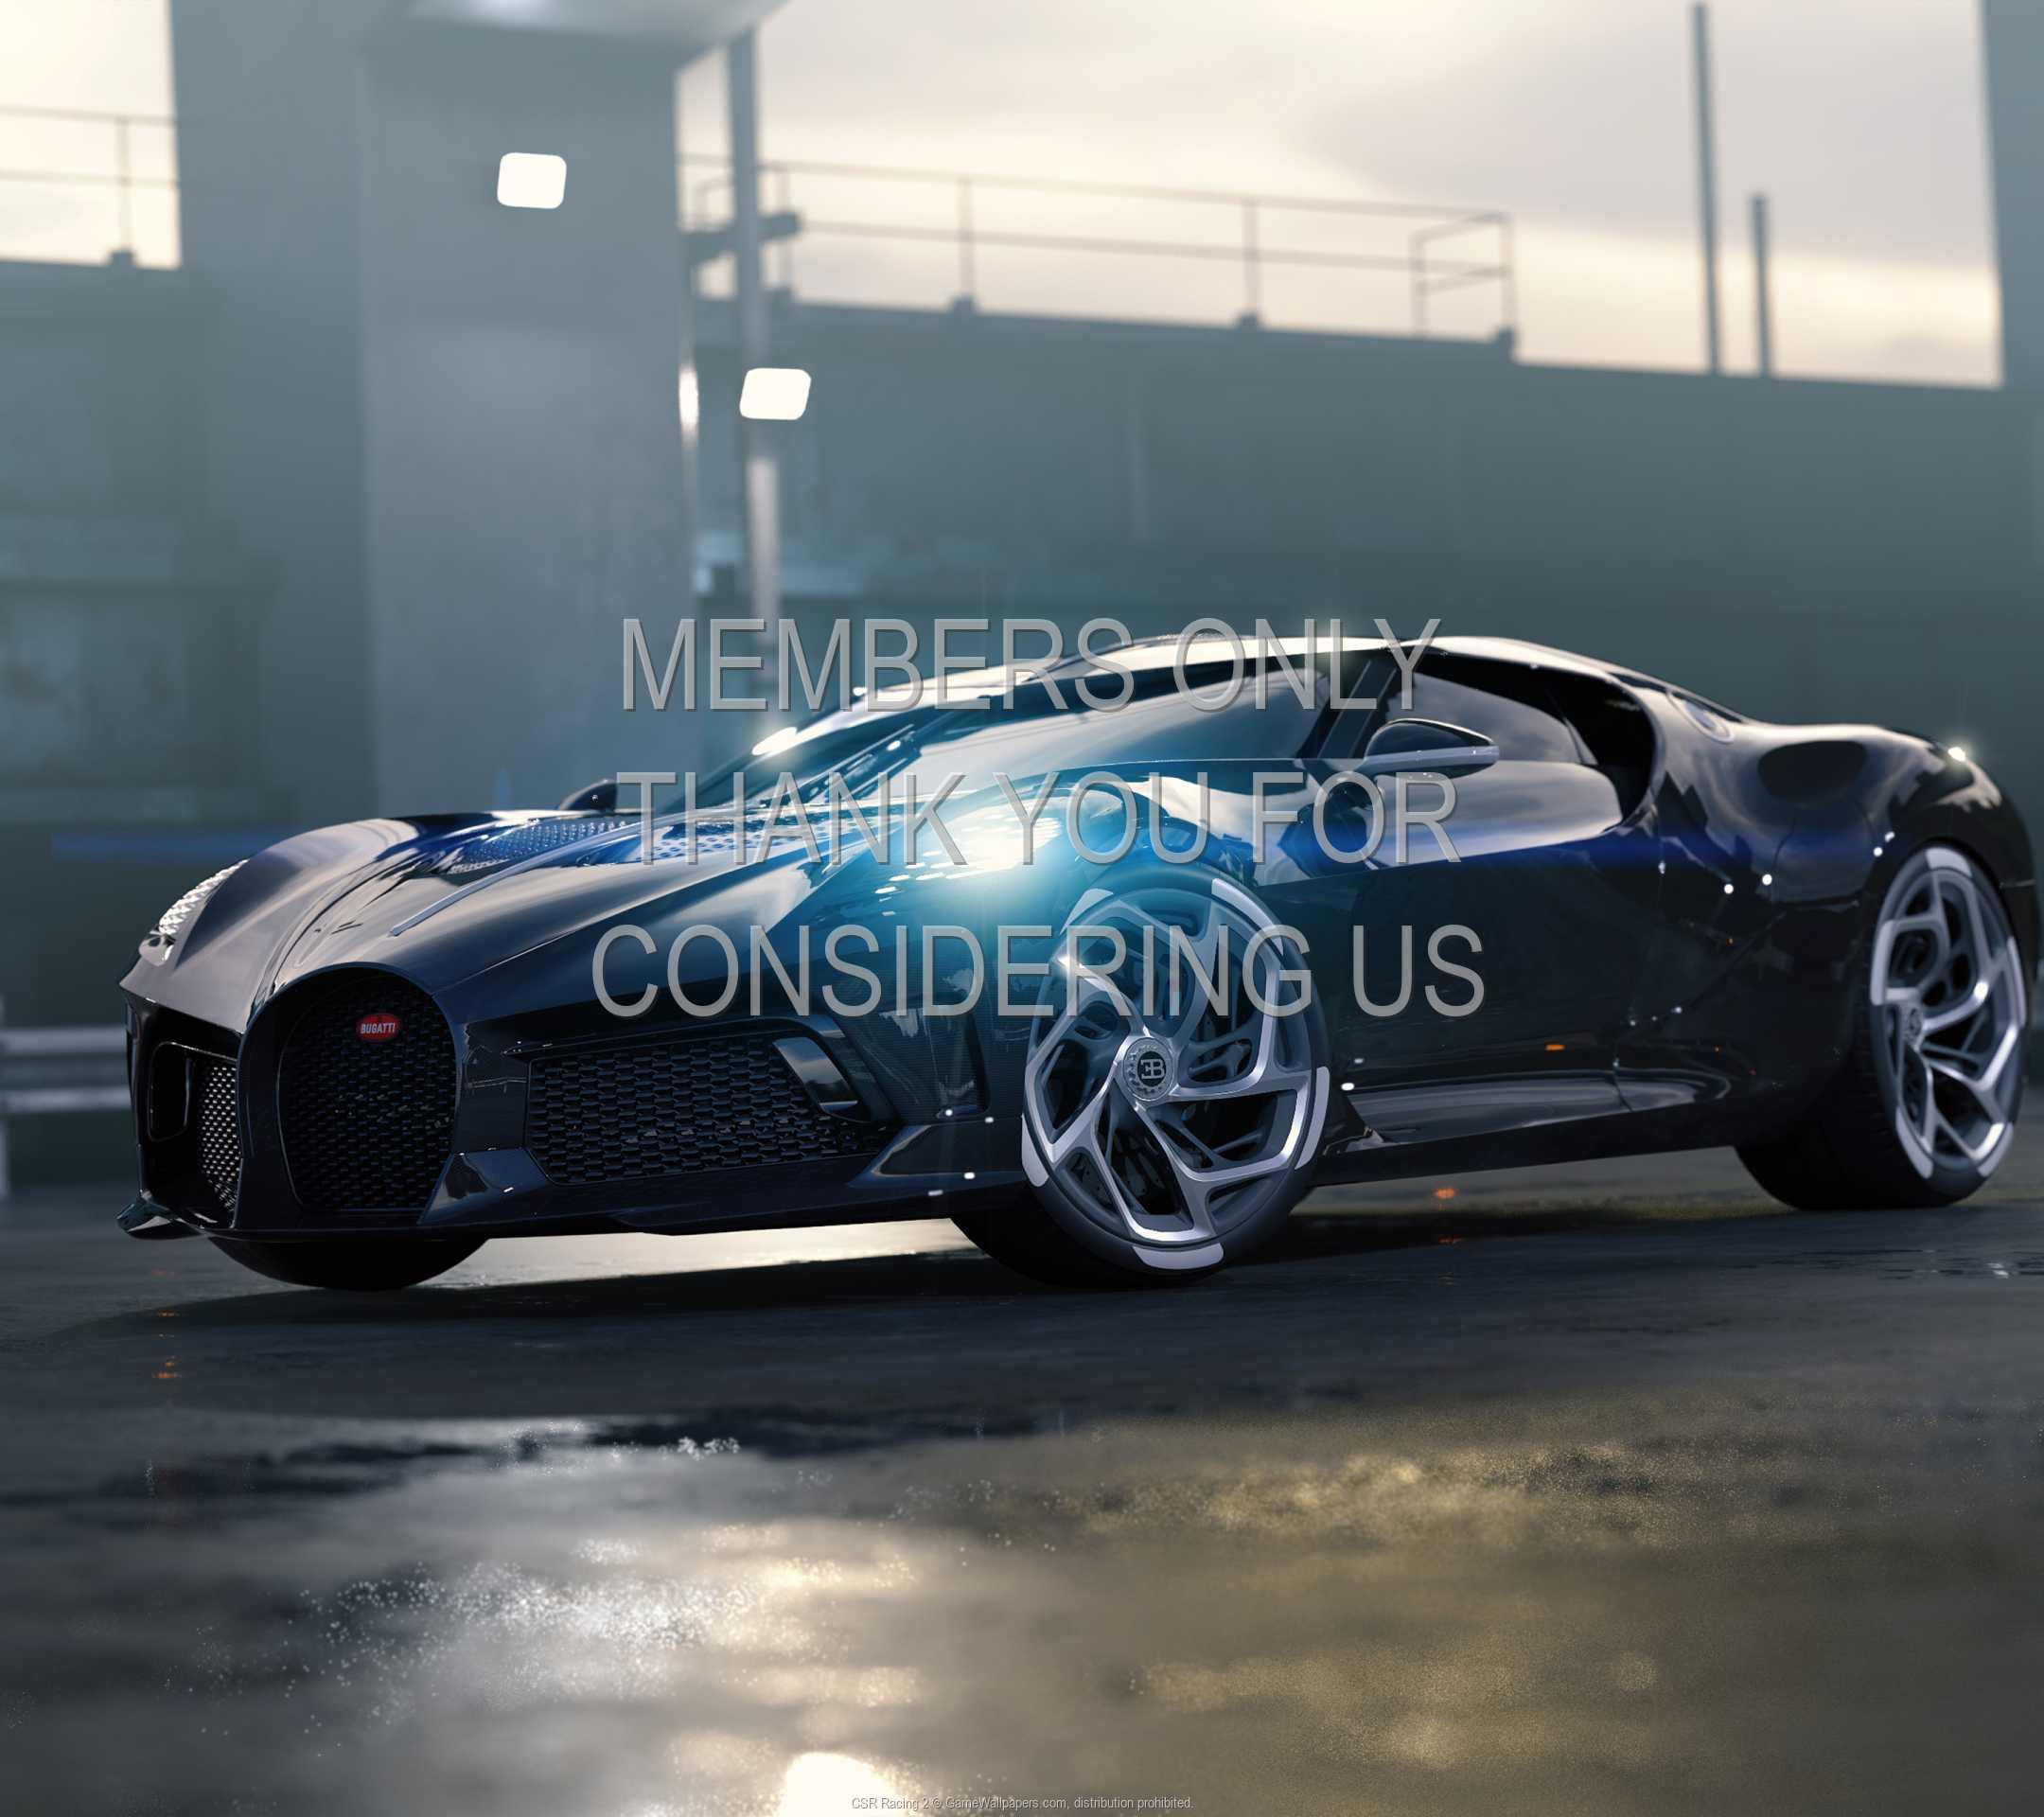 CSR Racing 2 1080p Horizontal Mobile wallpaper or background 01